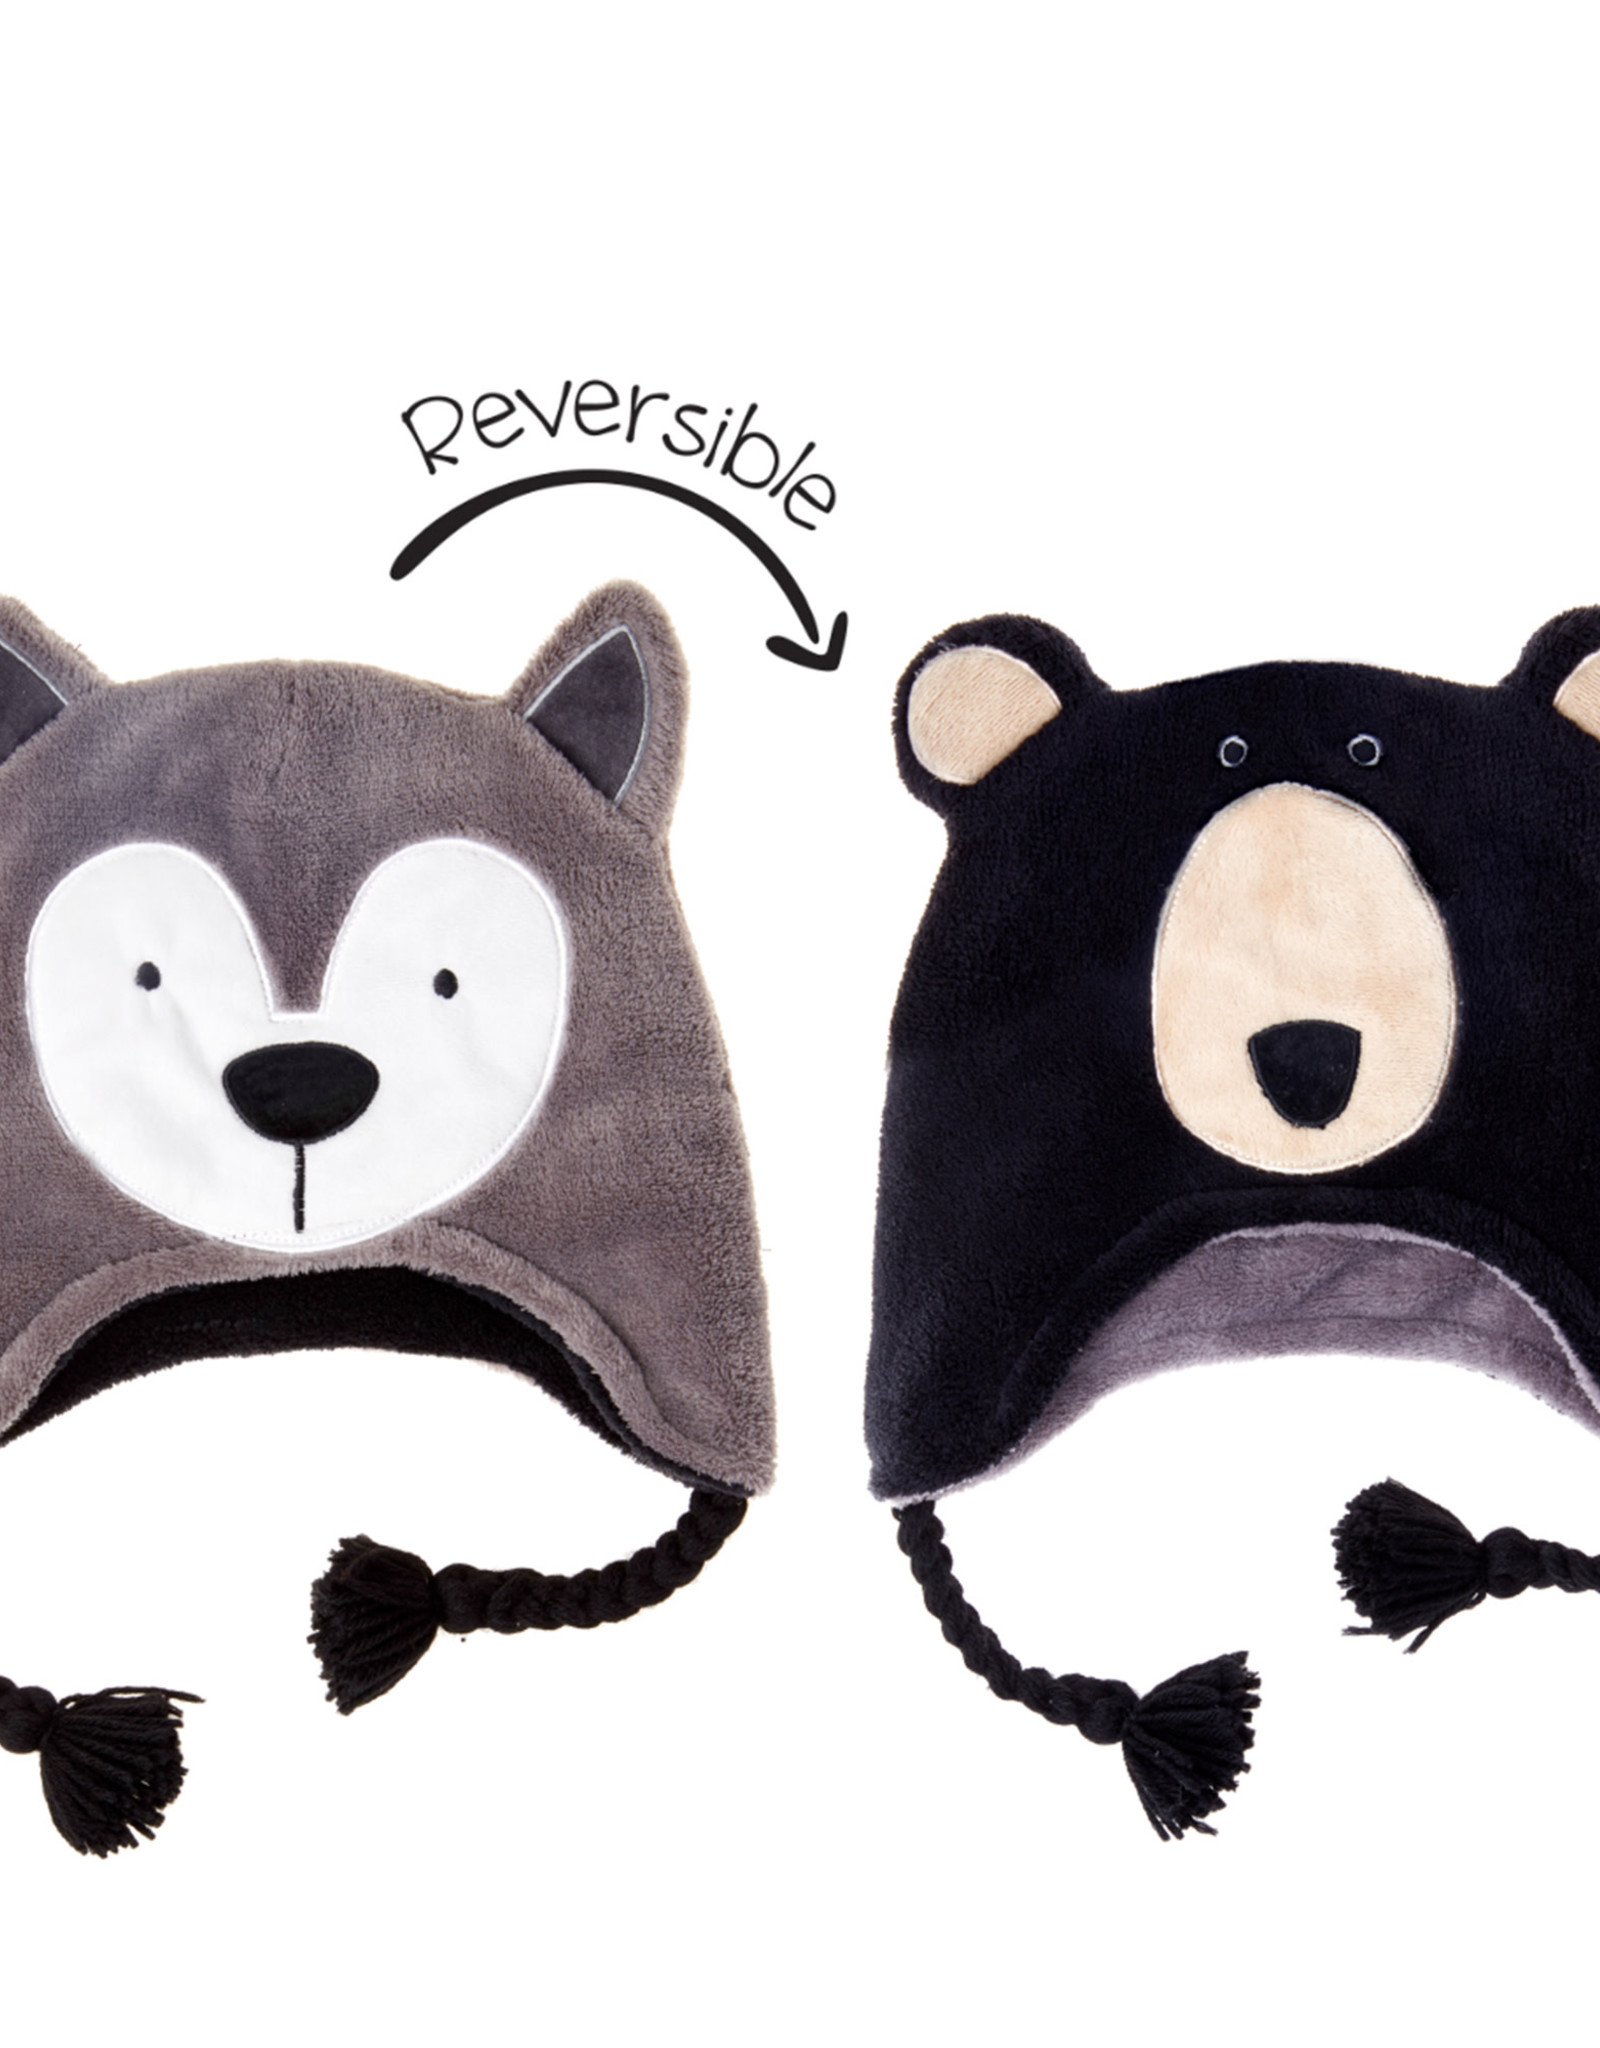 FlapJackKids FlapJackKids Reversible Fleece Hat - Wolf/Black Bear - Baby/Toddler